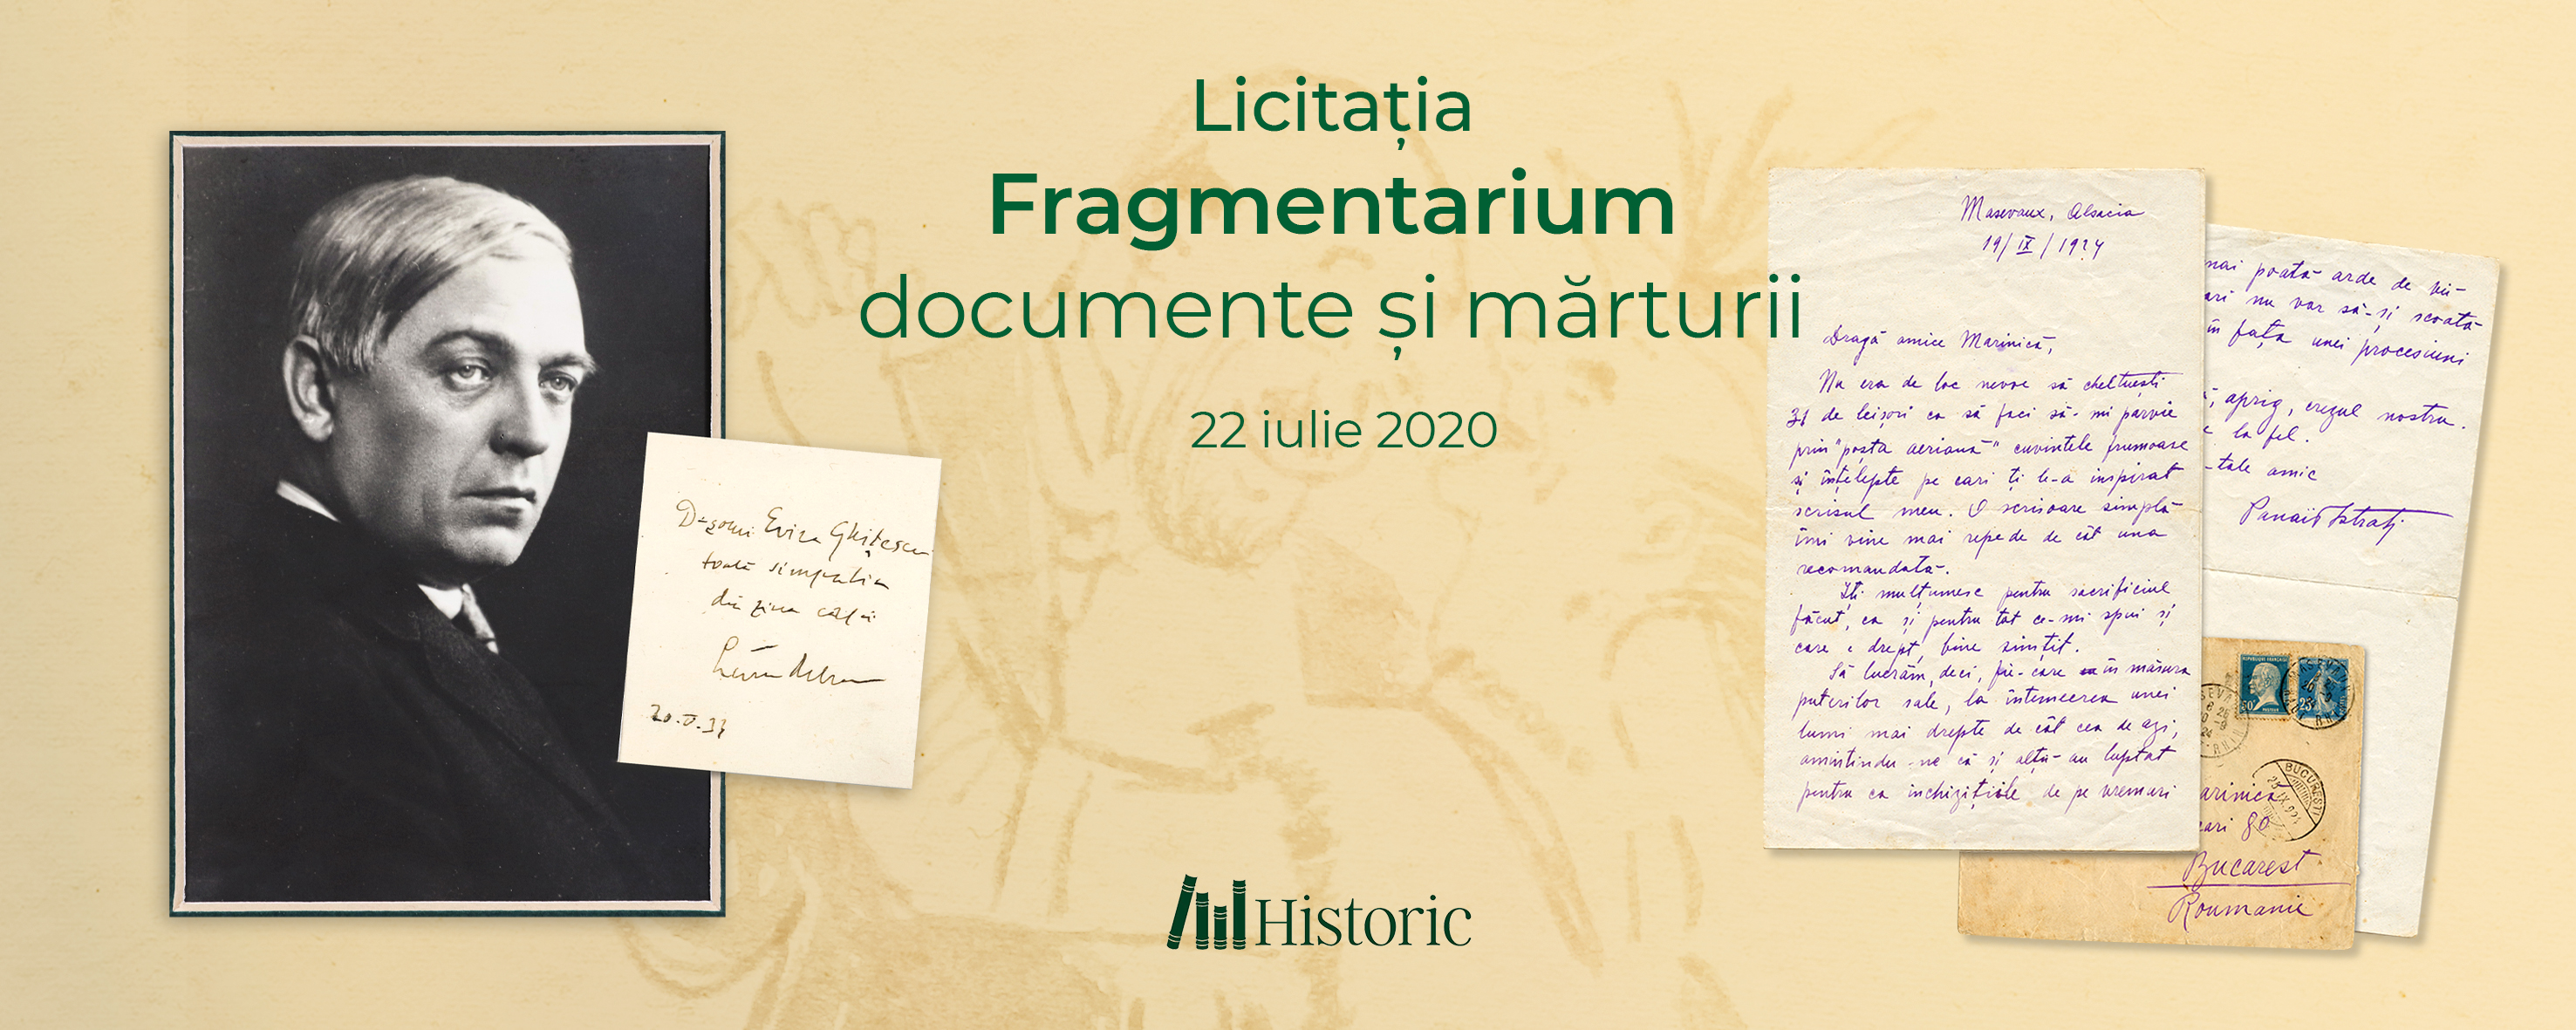 FRAGMENTARIUM - Documente și mărturii